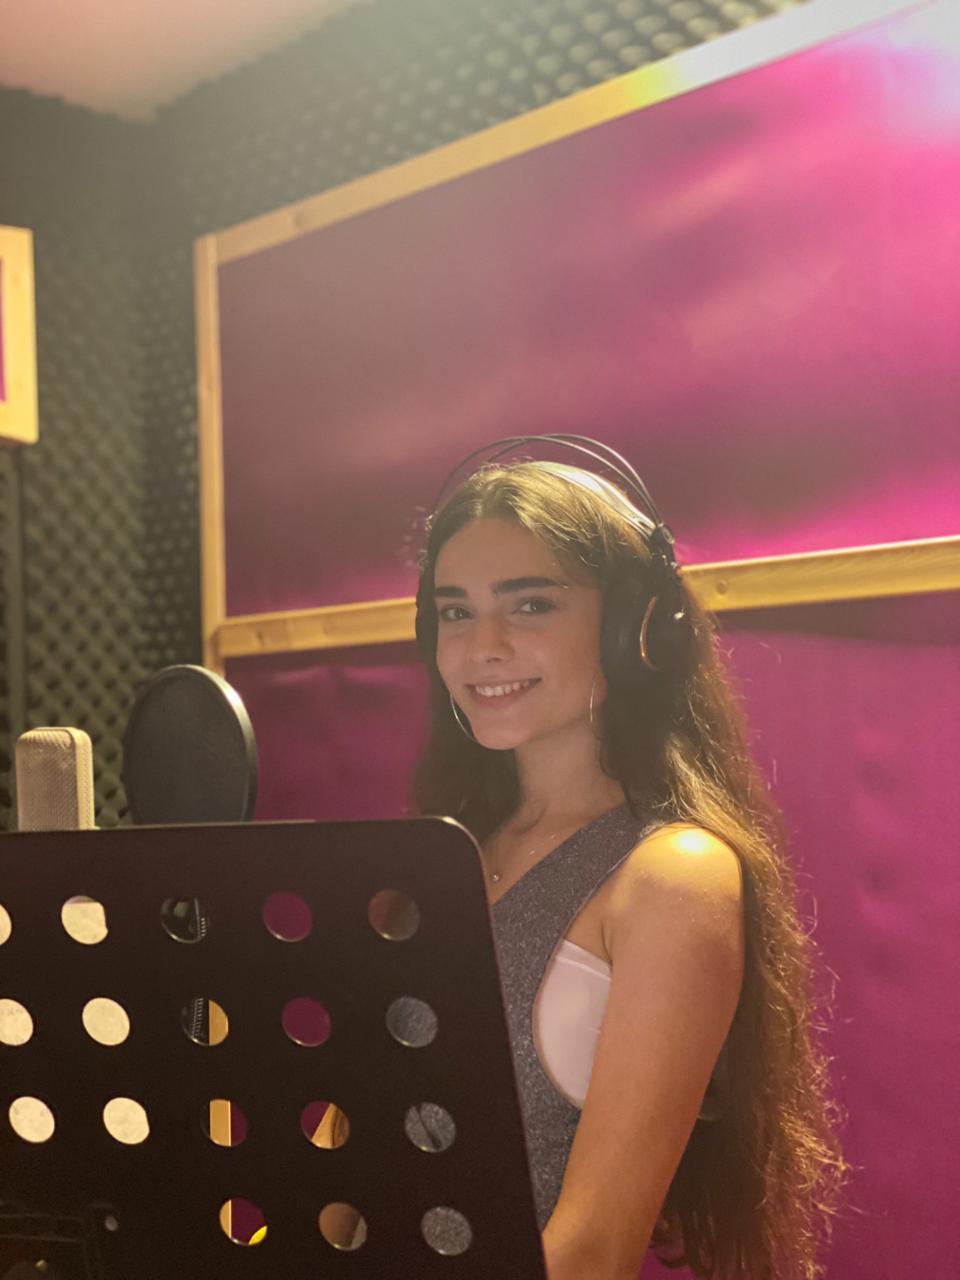 Фото: Лала Гафарова. Участница команды Азербайджан конкурса